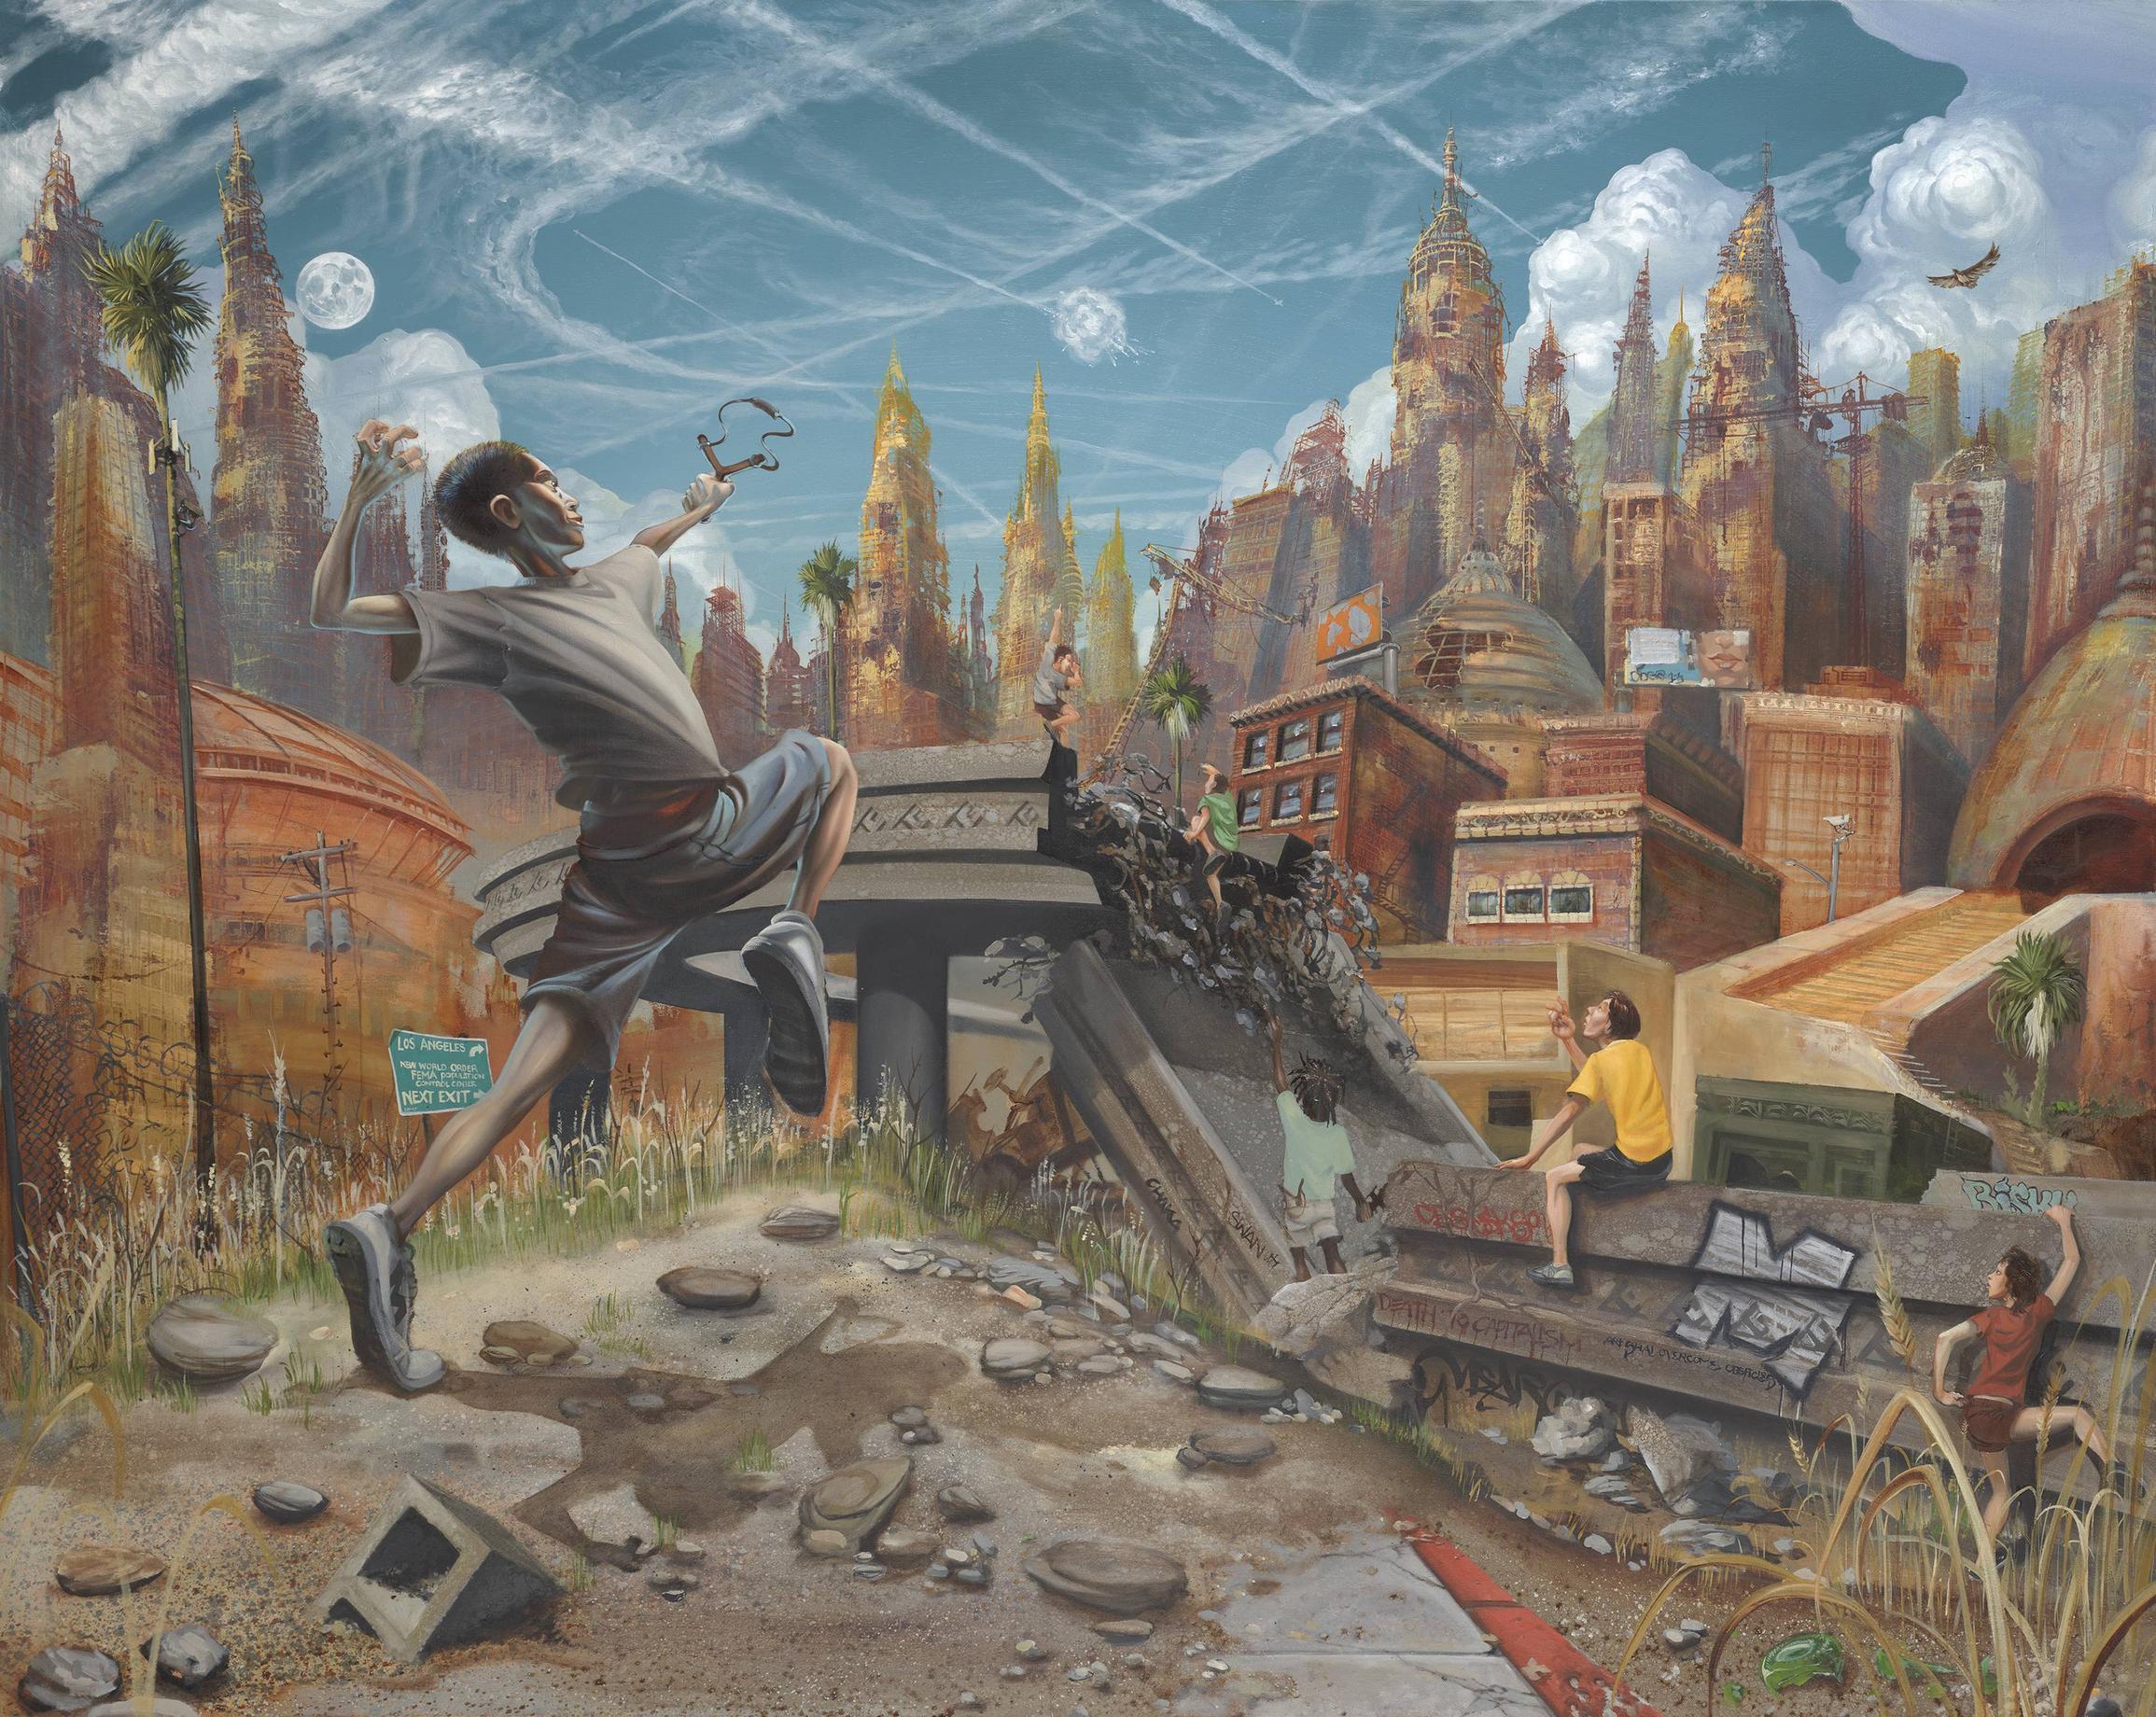 Freeport - David & Goliath 65/100